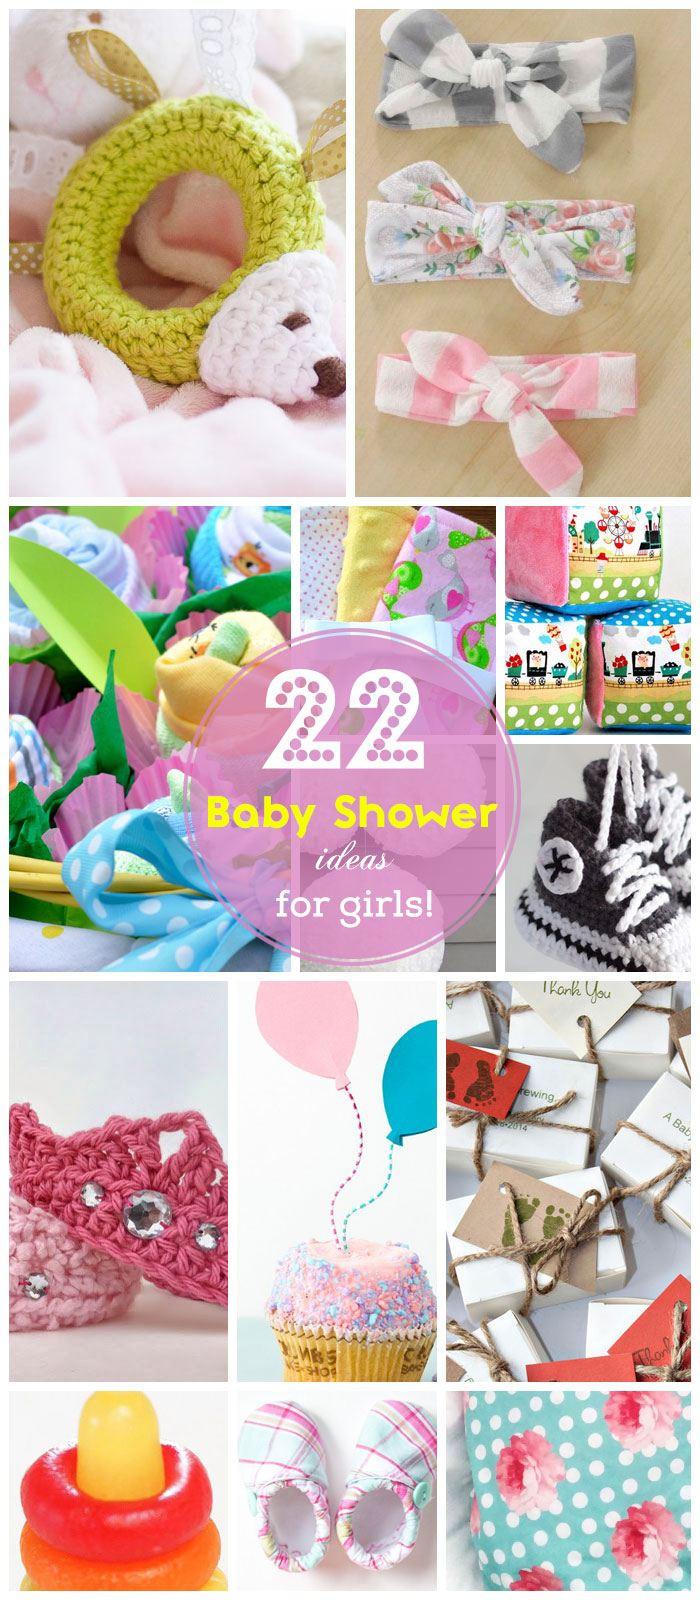 Baby Shower DIY Ideas  55 Easy Baby Shower Ideas for Girls